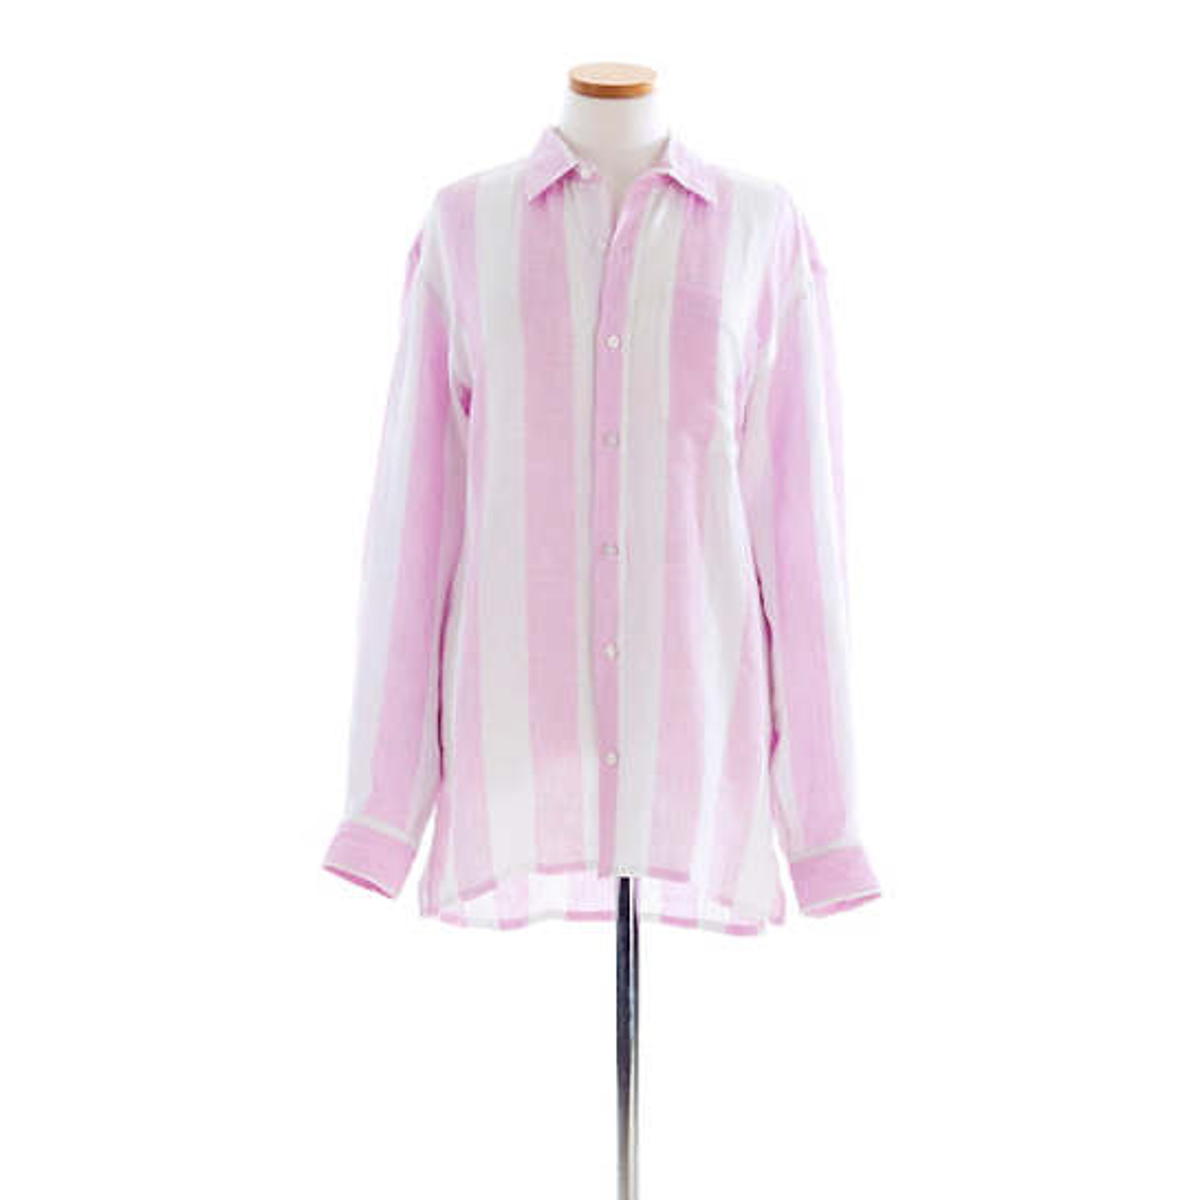 Reese Linen Lilac Stripe Shirt